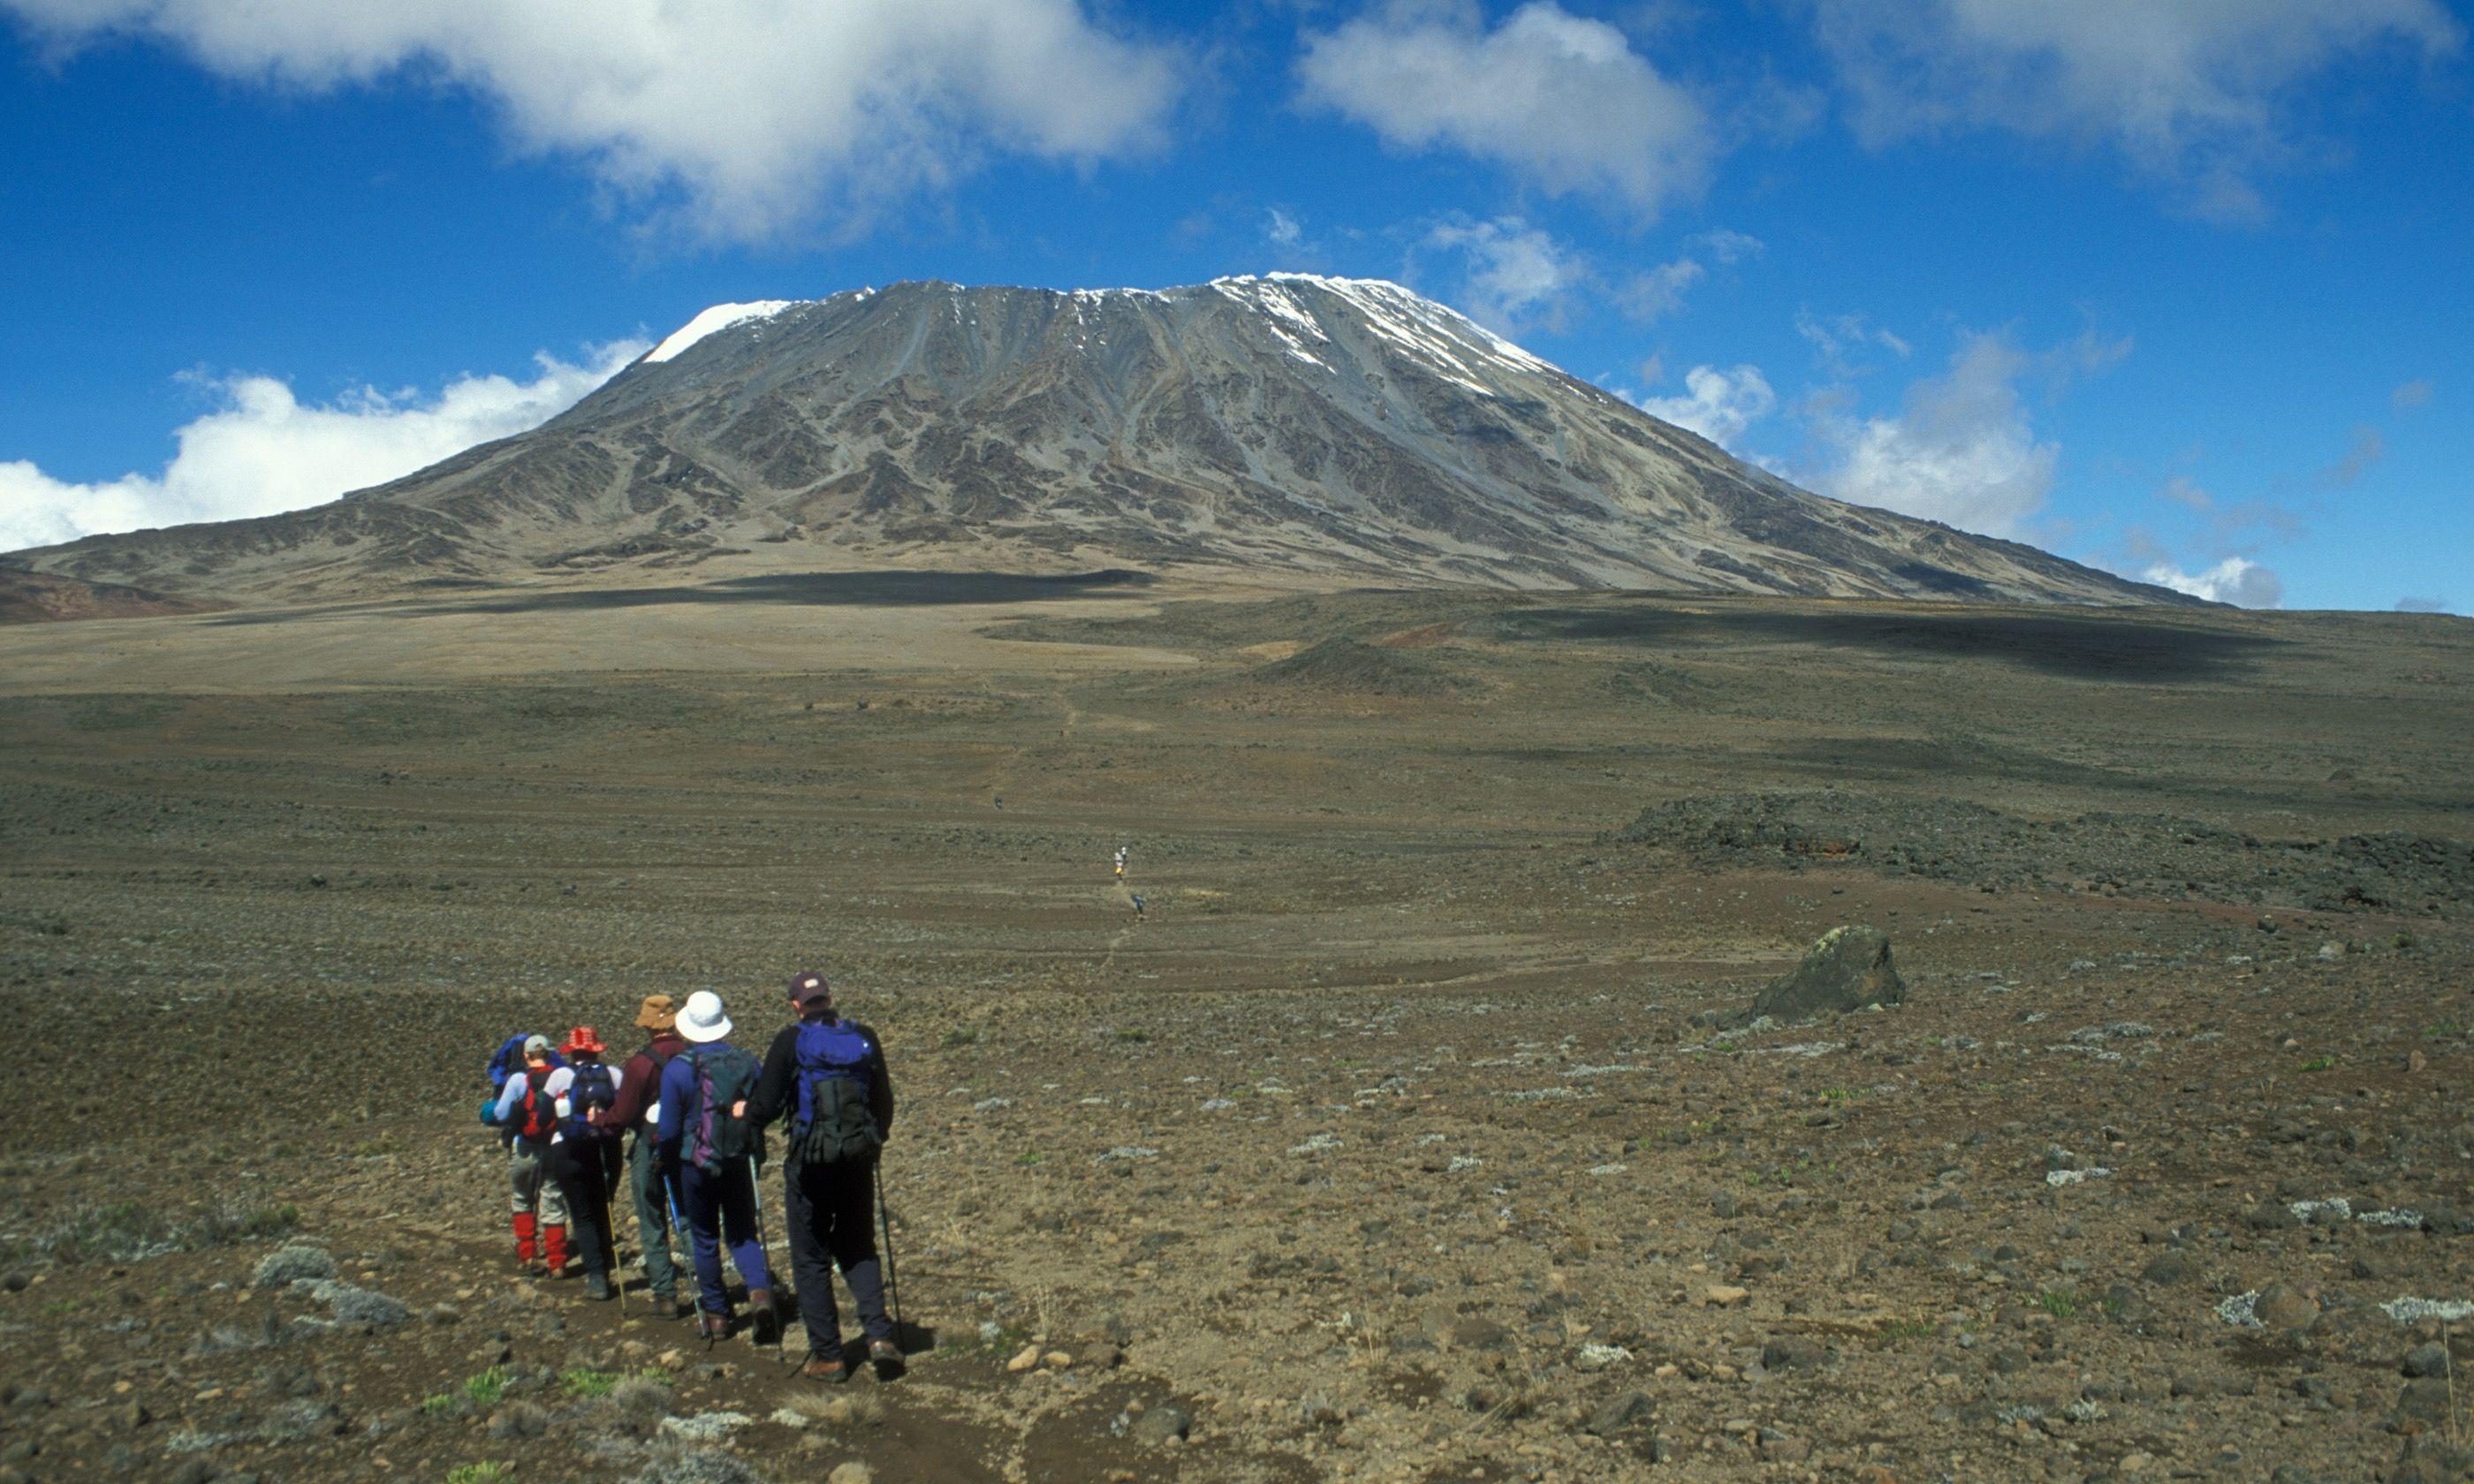 Trekkers on Mount Kilimanjaro (Dreamstime)